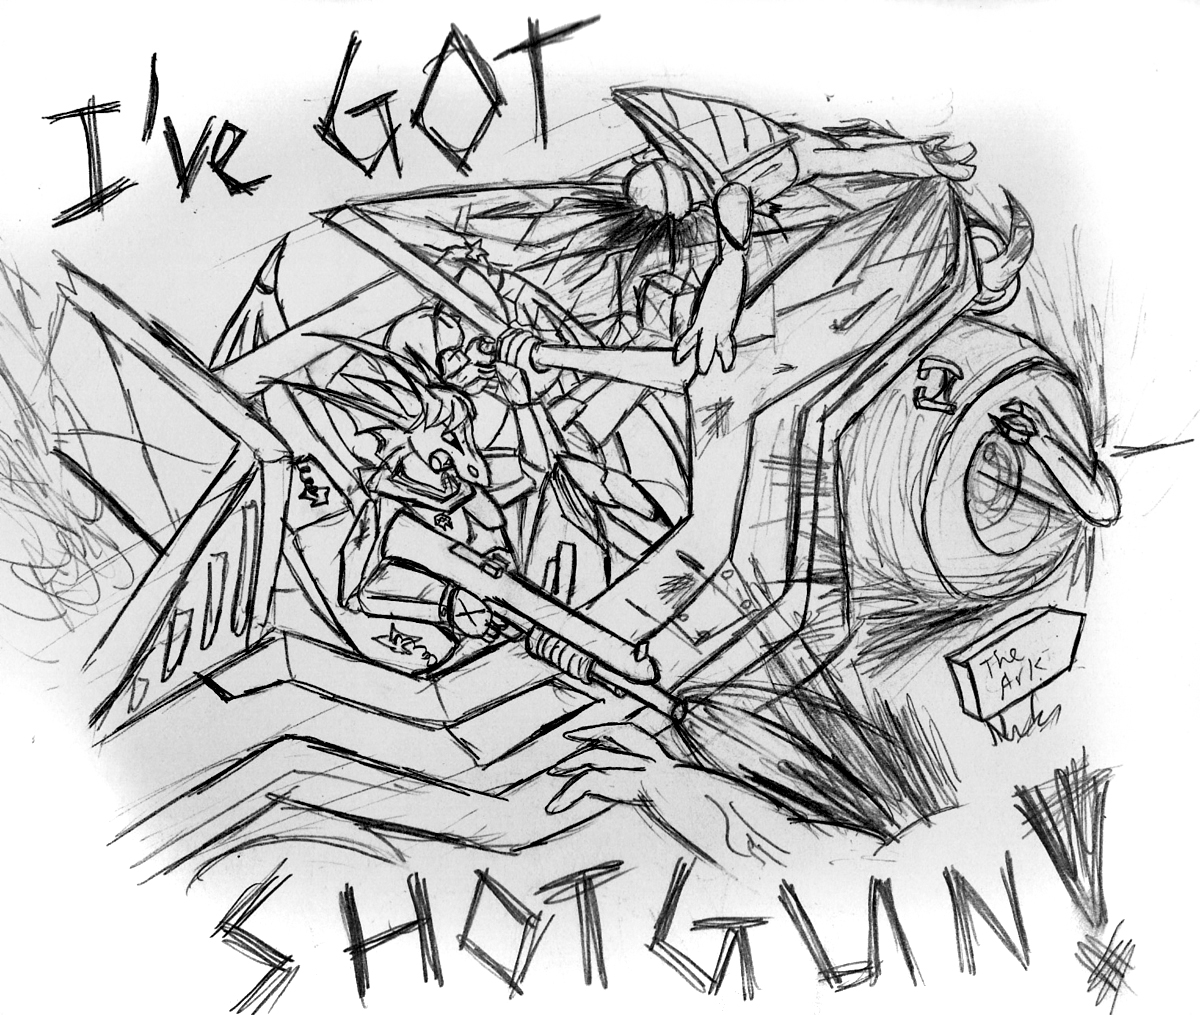 I've Got SHOTGUN by Snowfyre